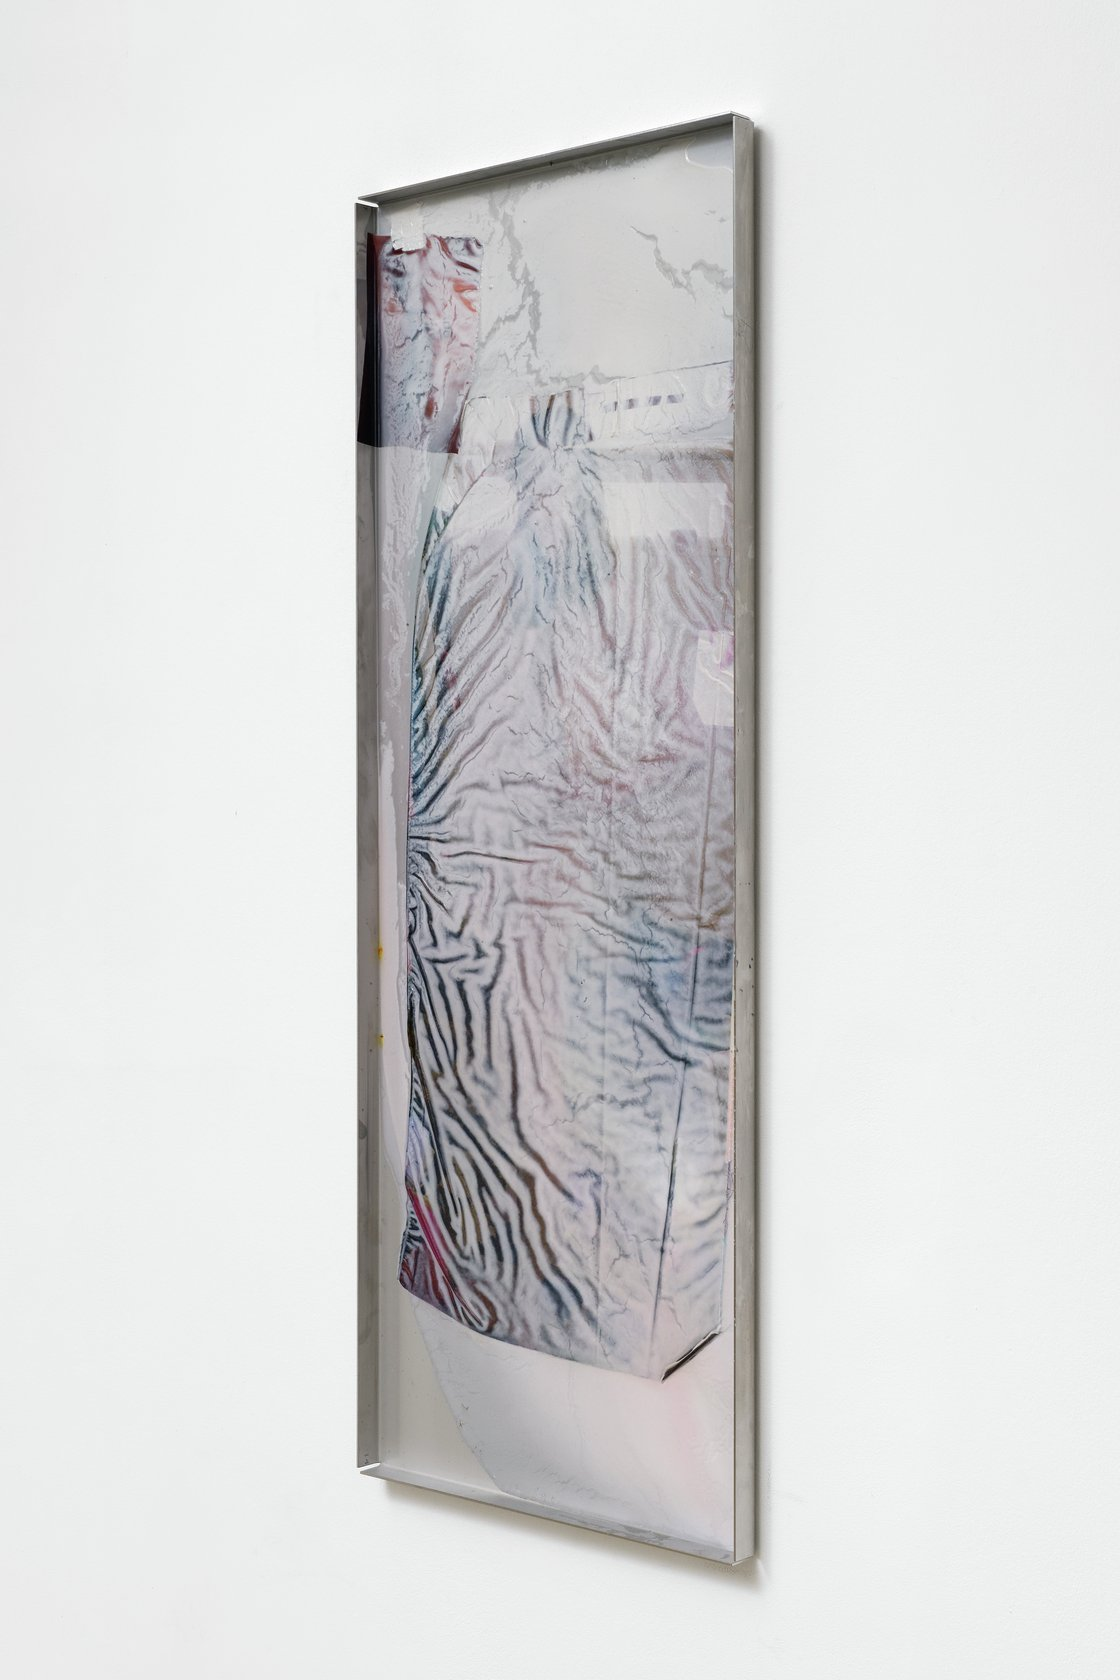 Mimosa Echard, Narcisse  5, 2021